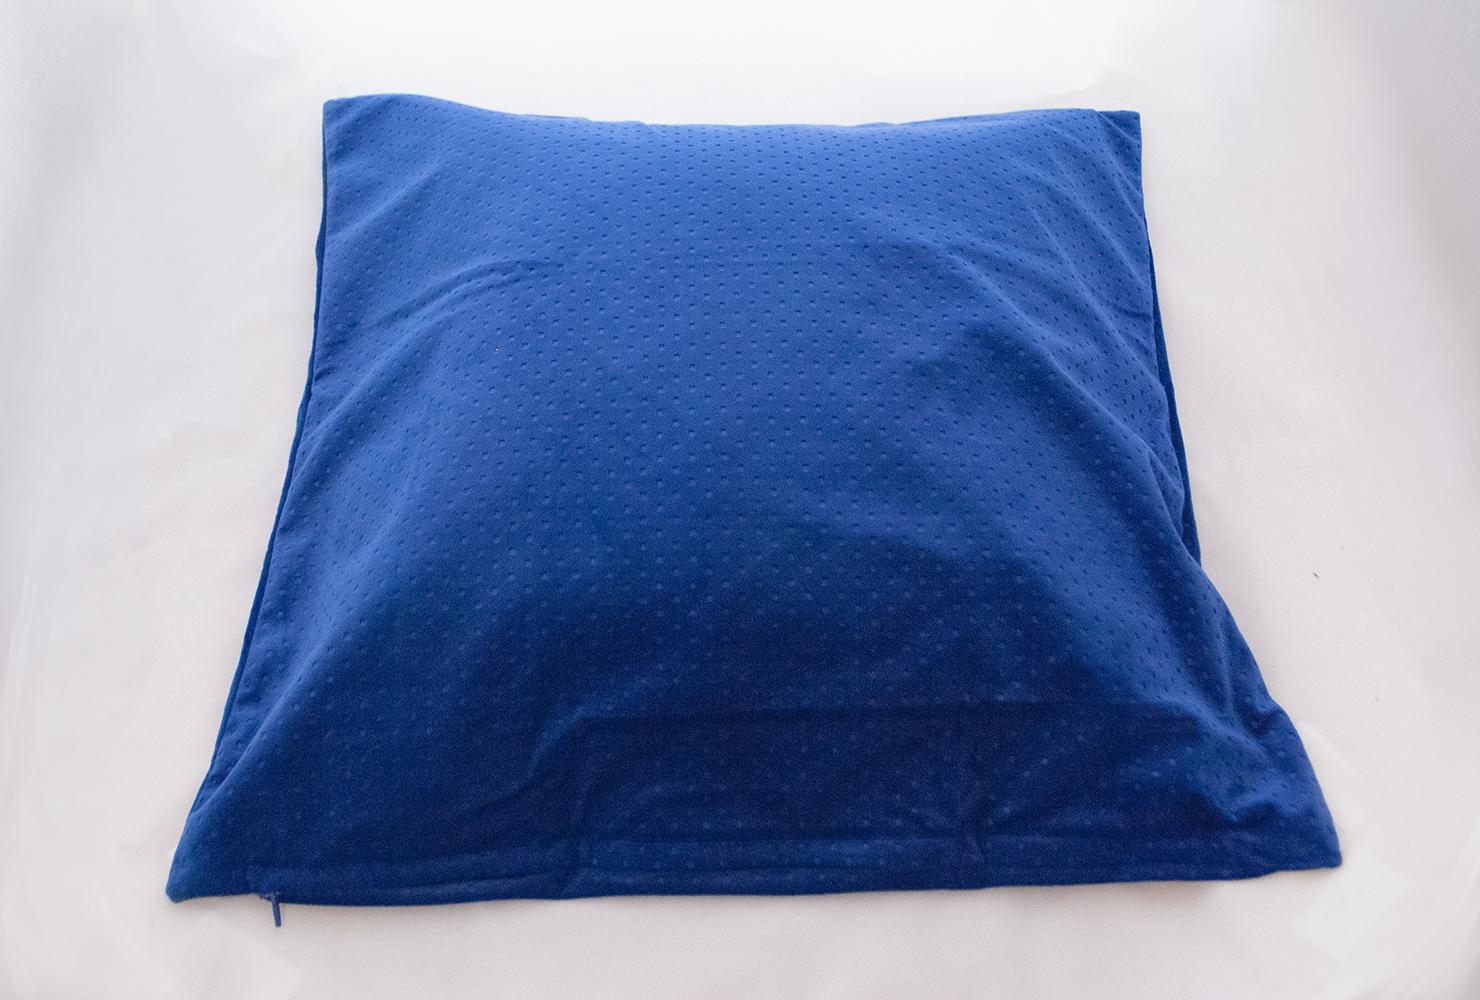 saphire pillow   Quantity: 2  Price: $10.00